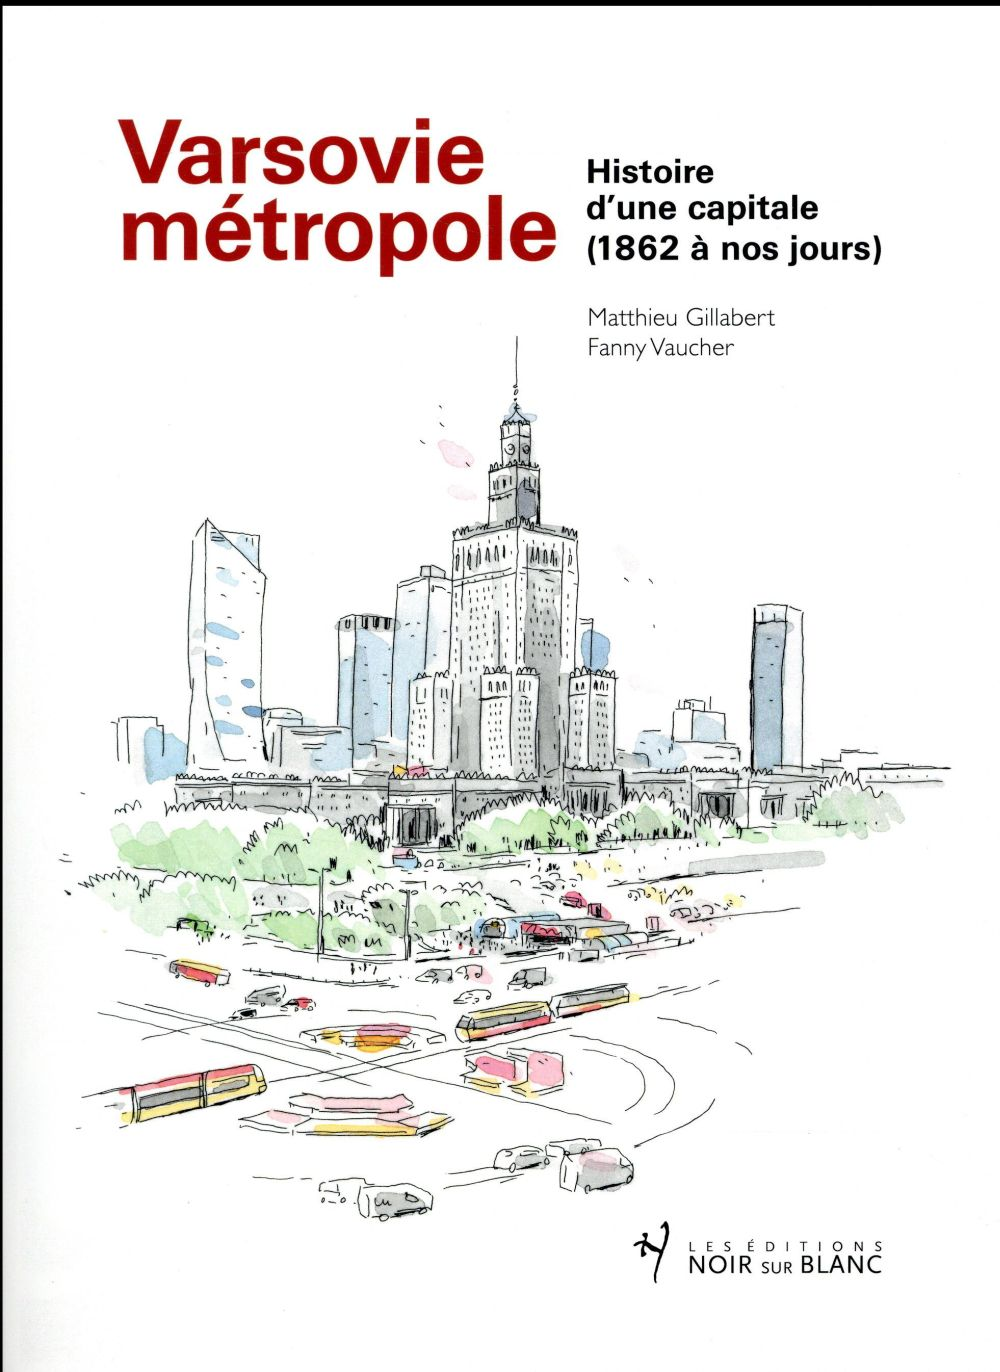 Varsovie métropole ; histoire d'une capitale, 1862-2016